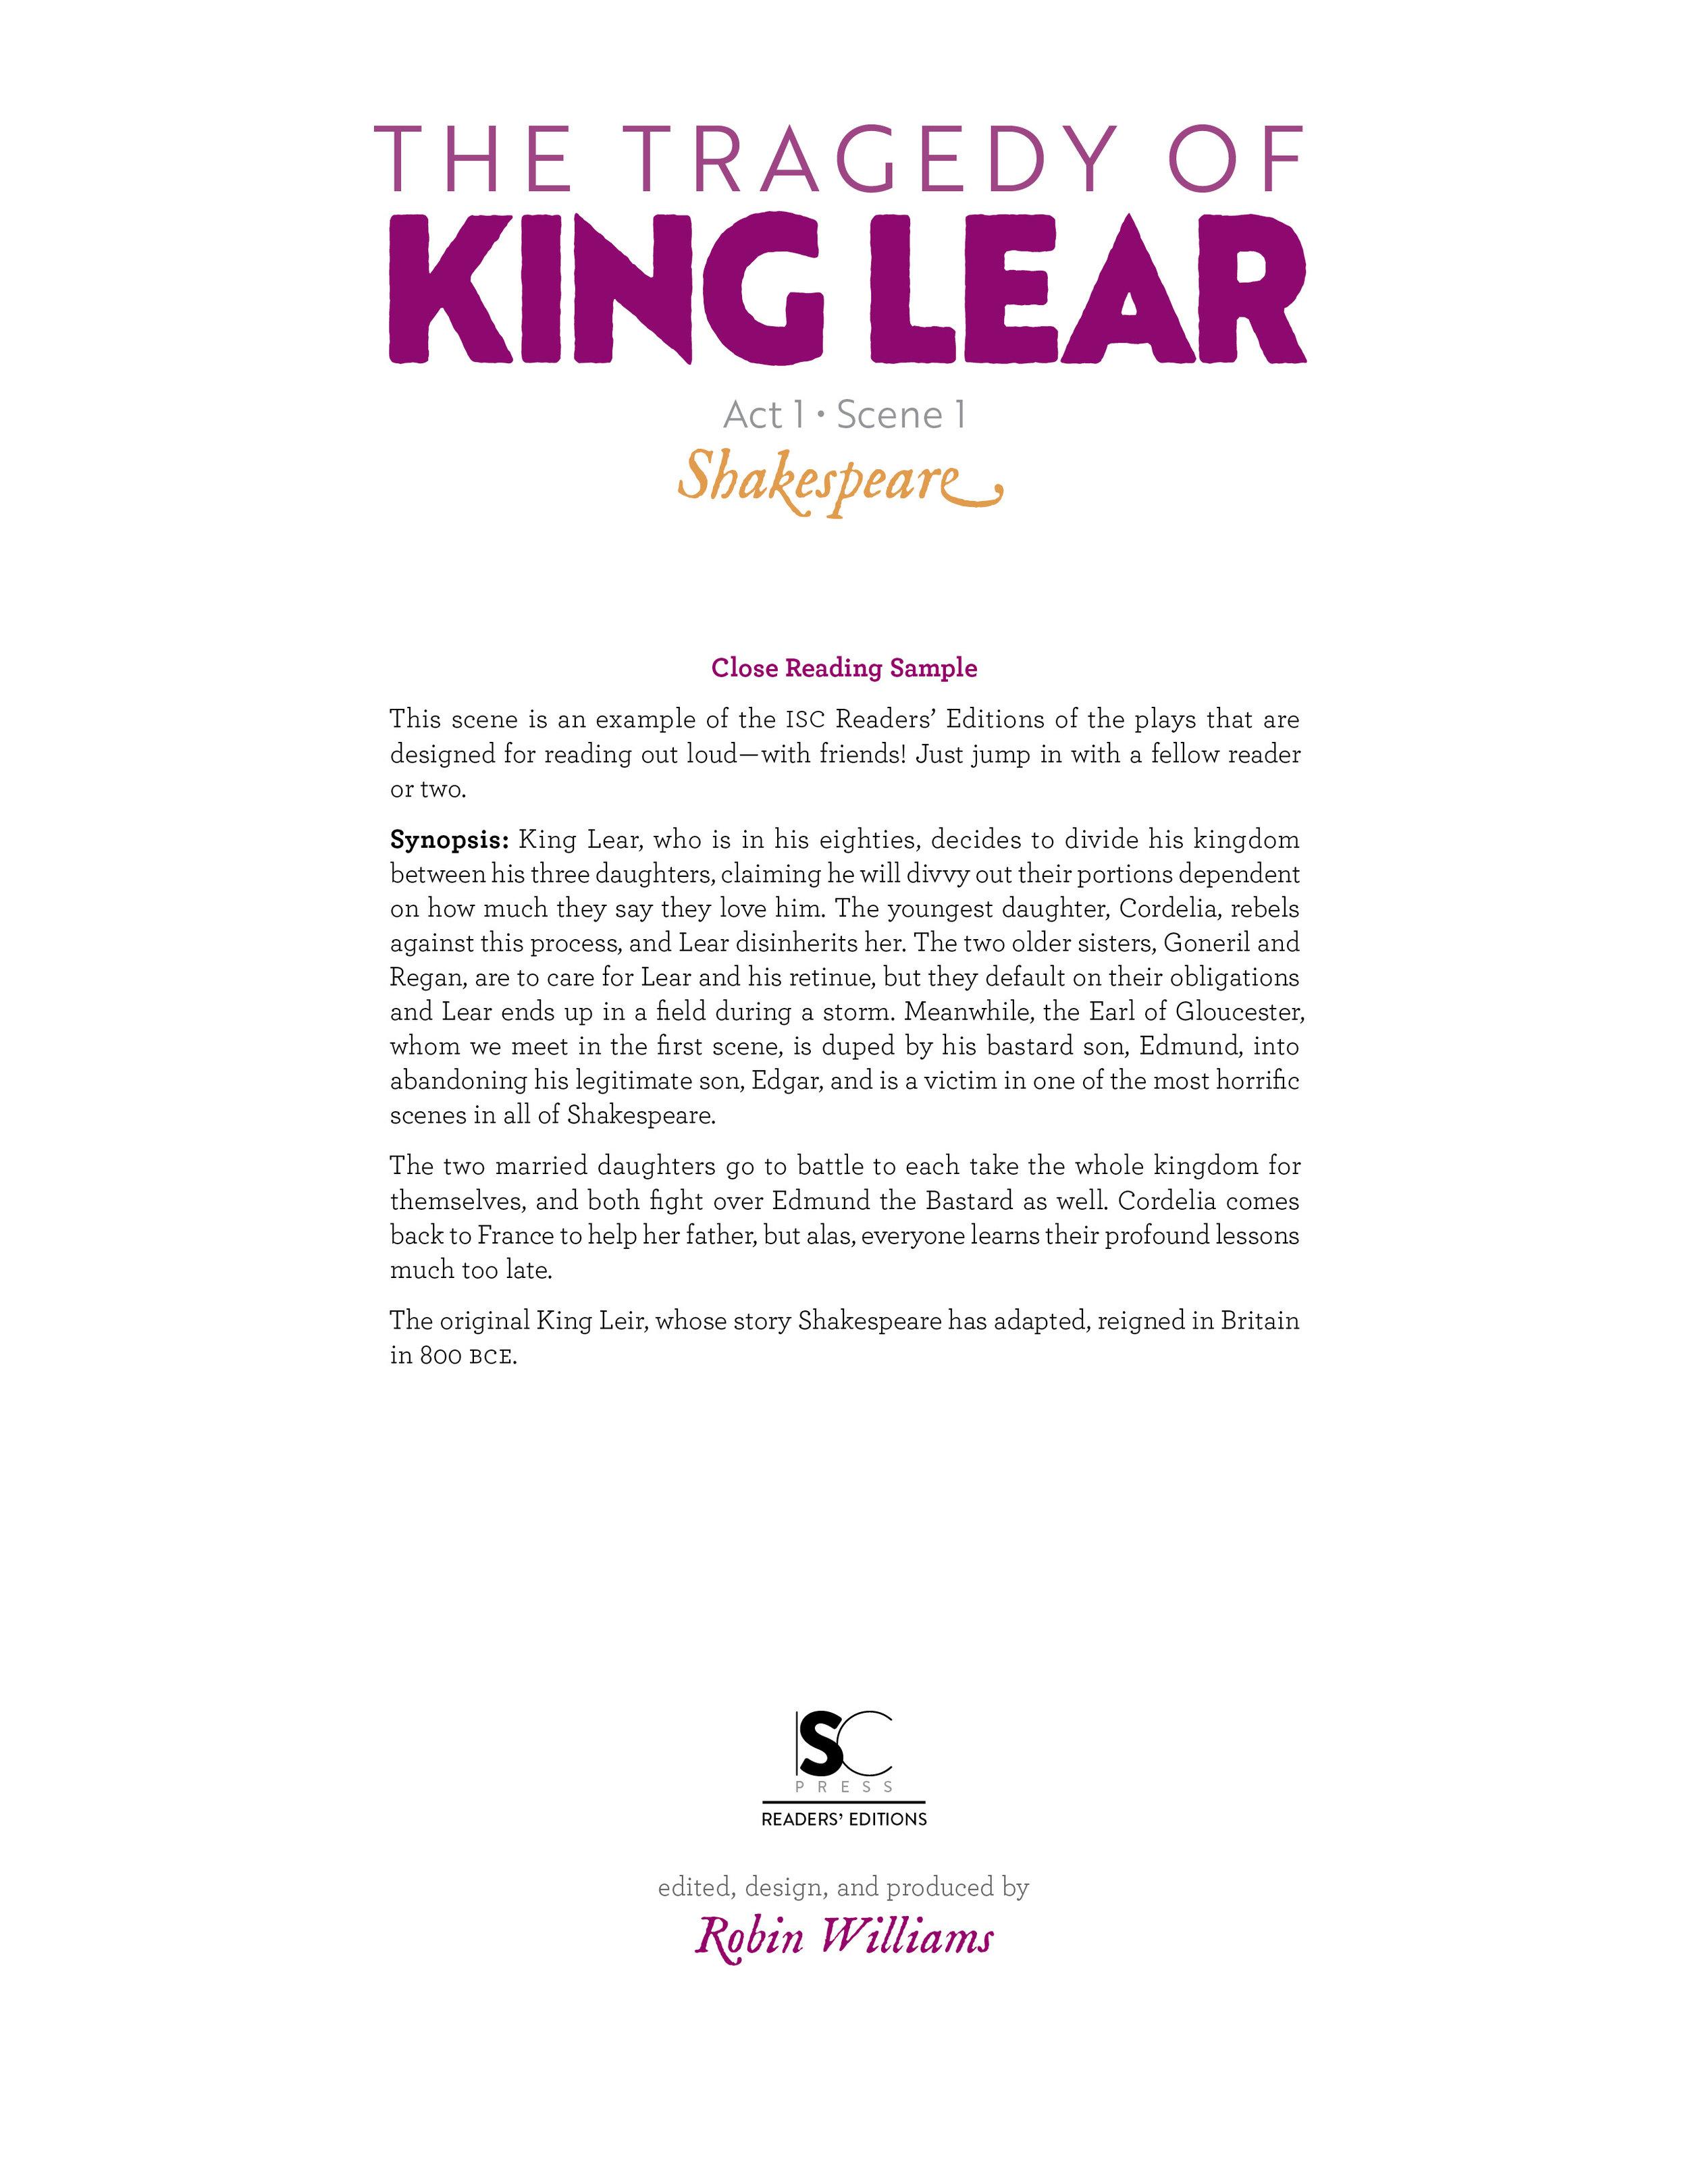 King Lear • Readers' Edition • iReadShakespeare.org